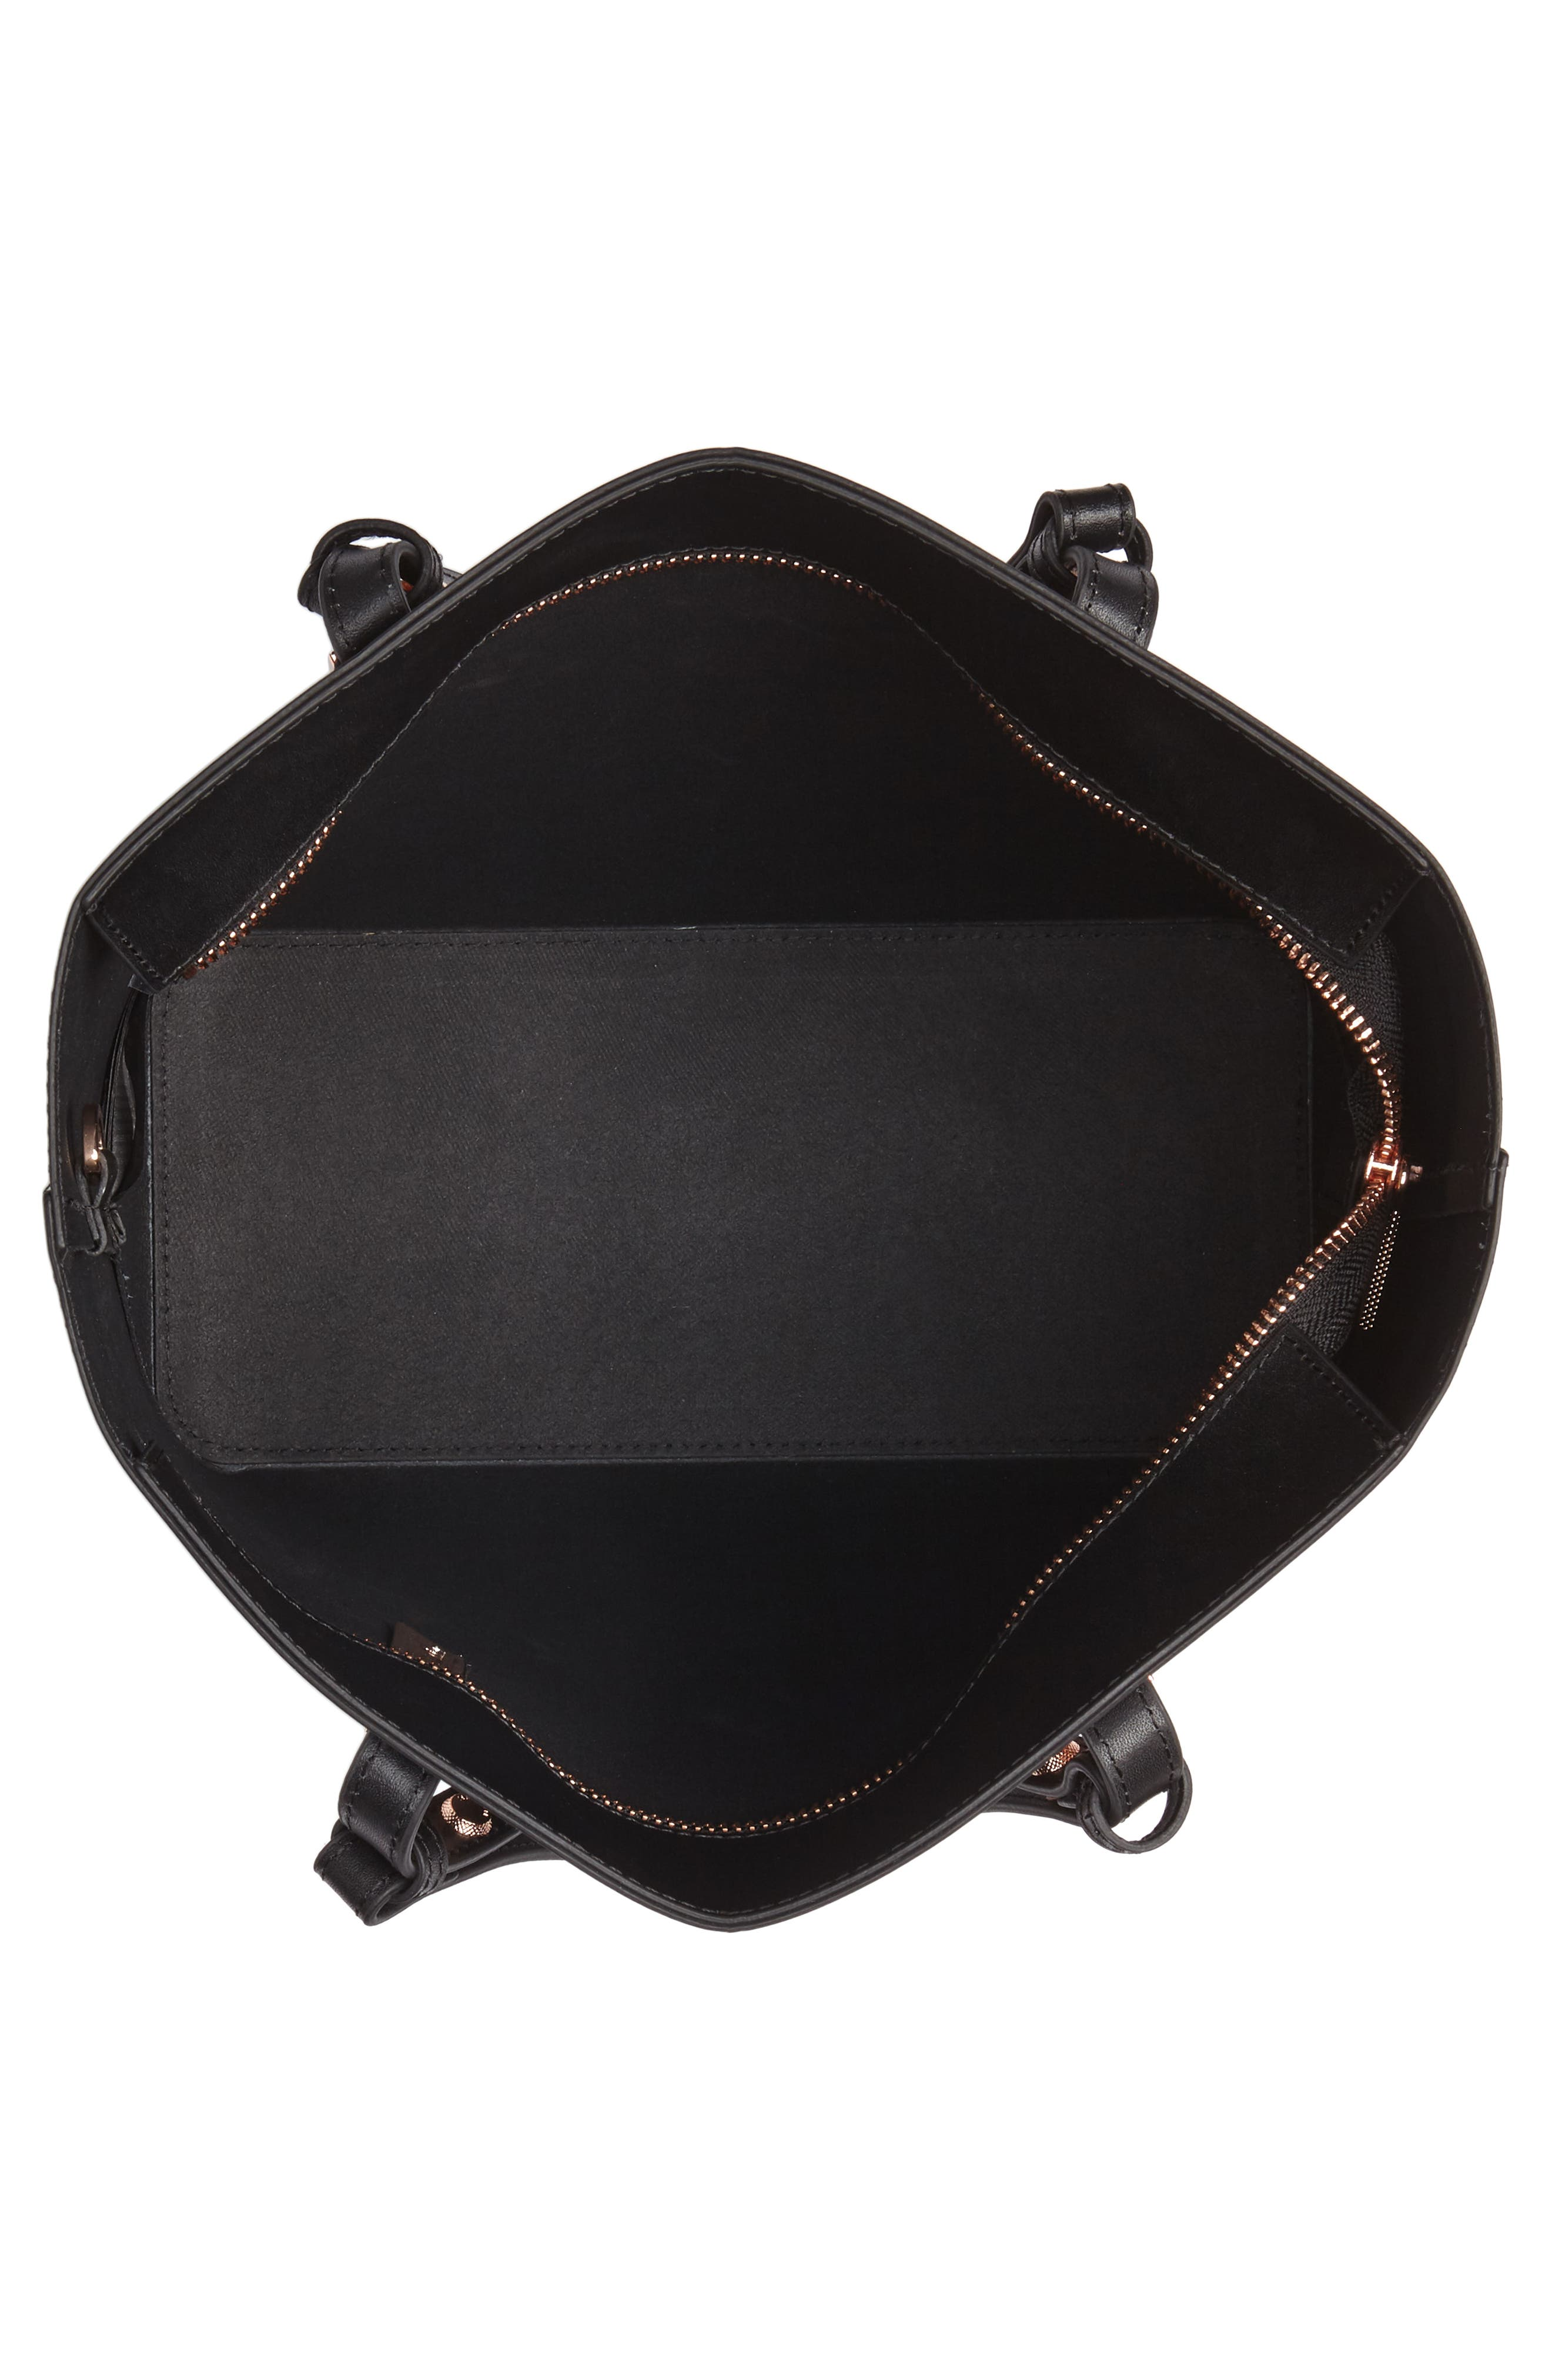 Jaceyy Adjustable Handle Leather Shopper,                             Alternate thumbnail 4, color,                             001